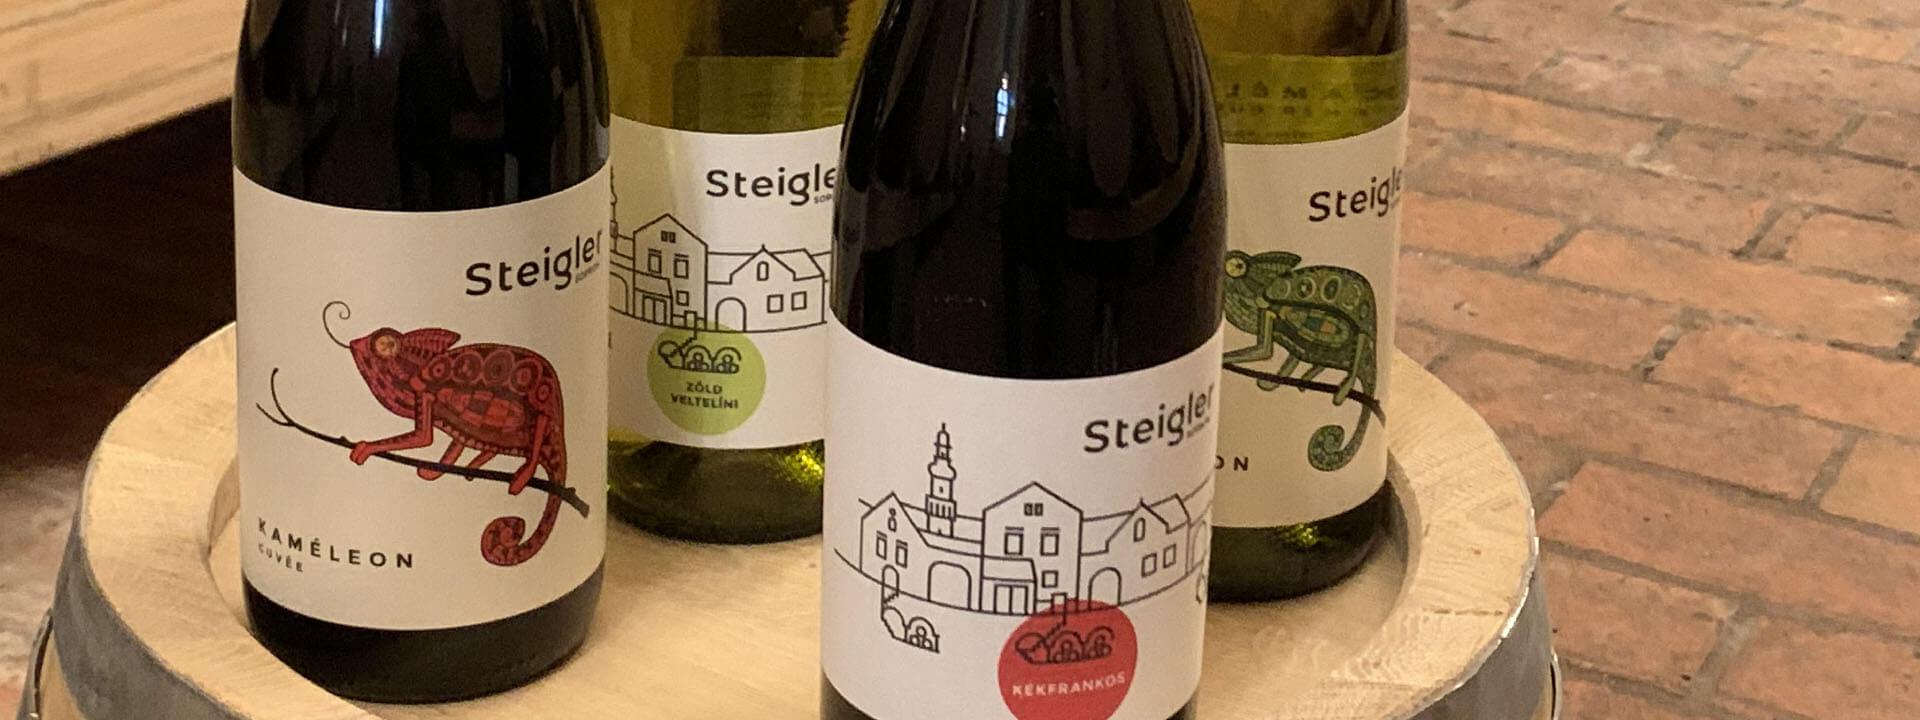 Steigler pince Sopron klasszikus borok